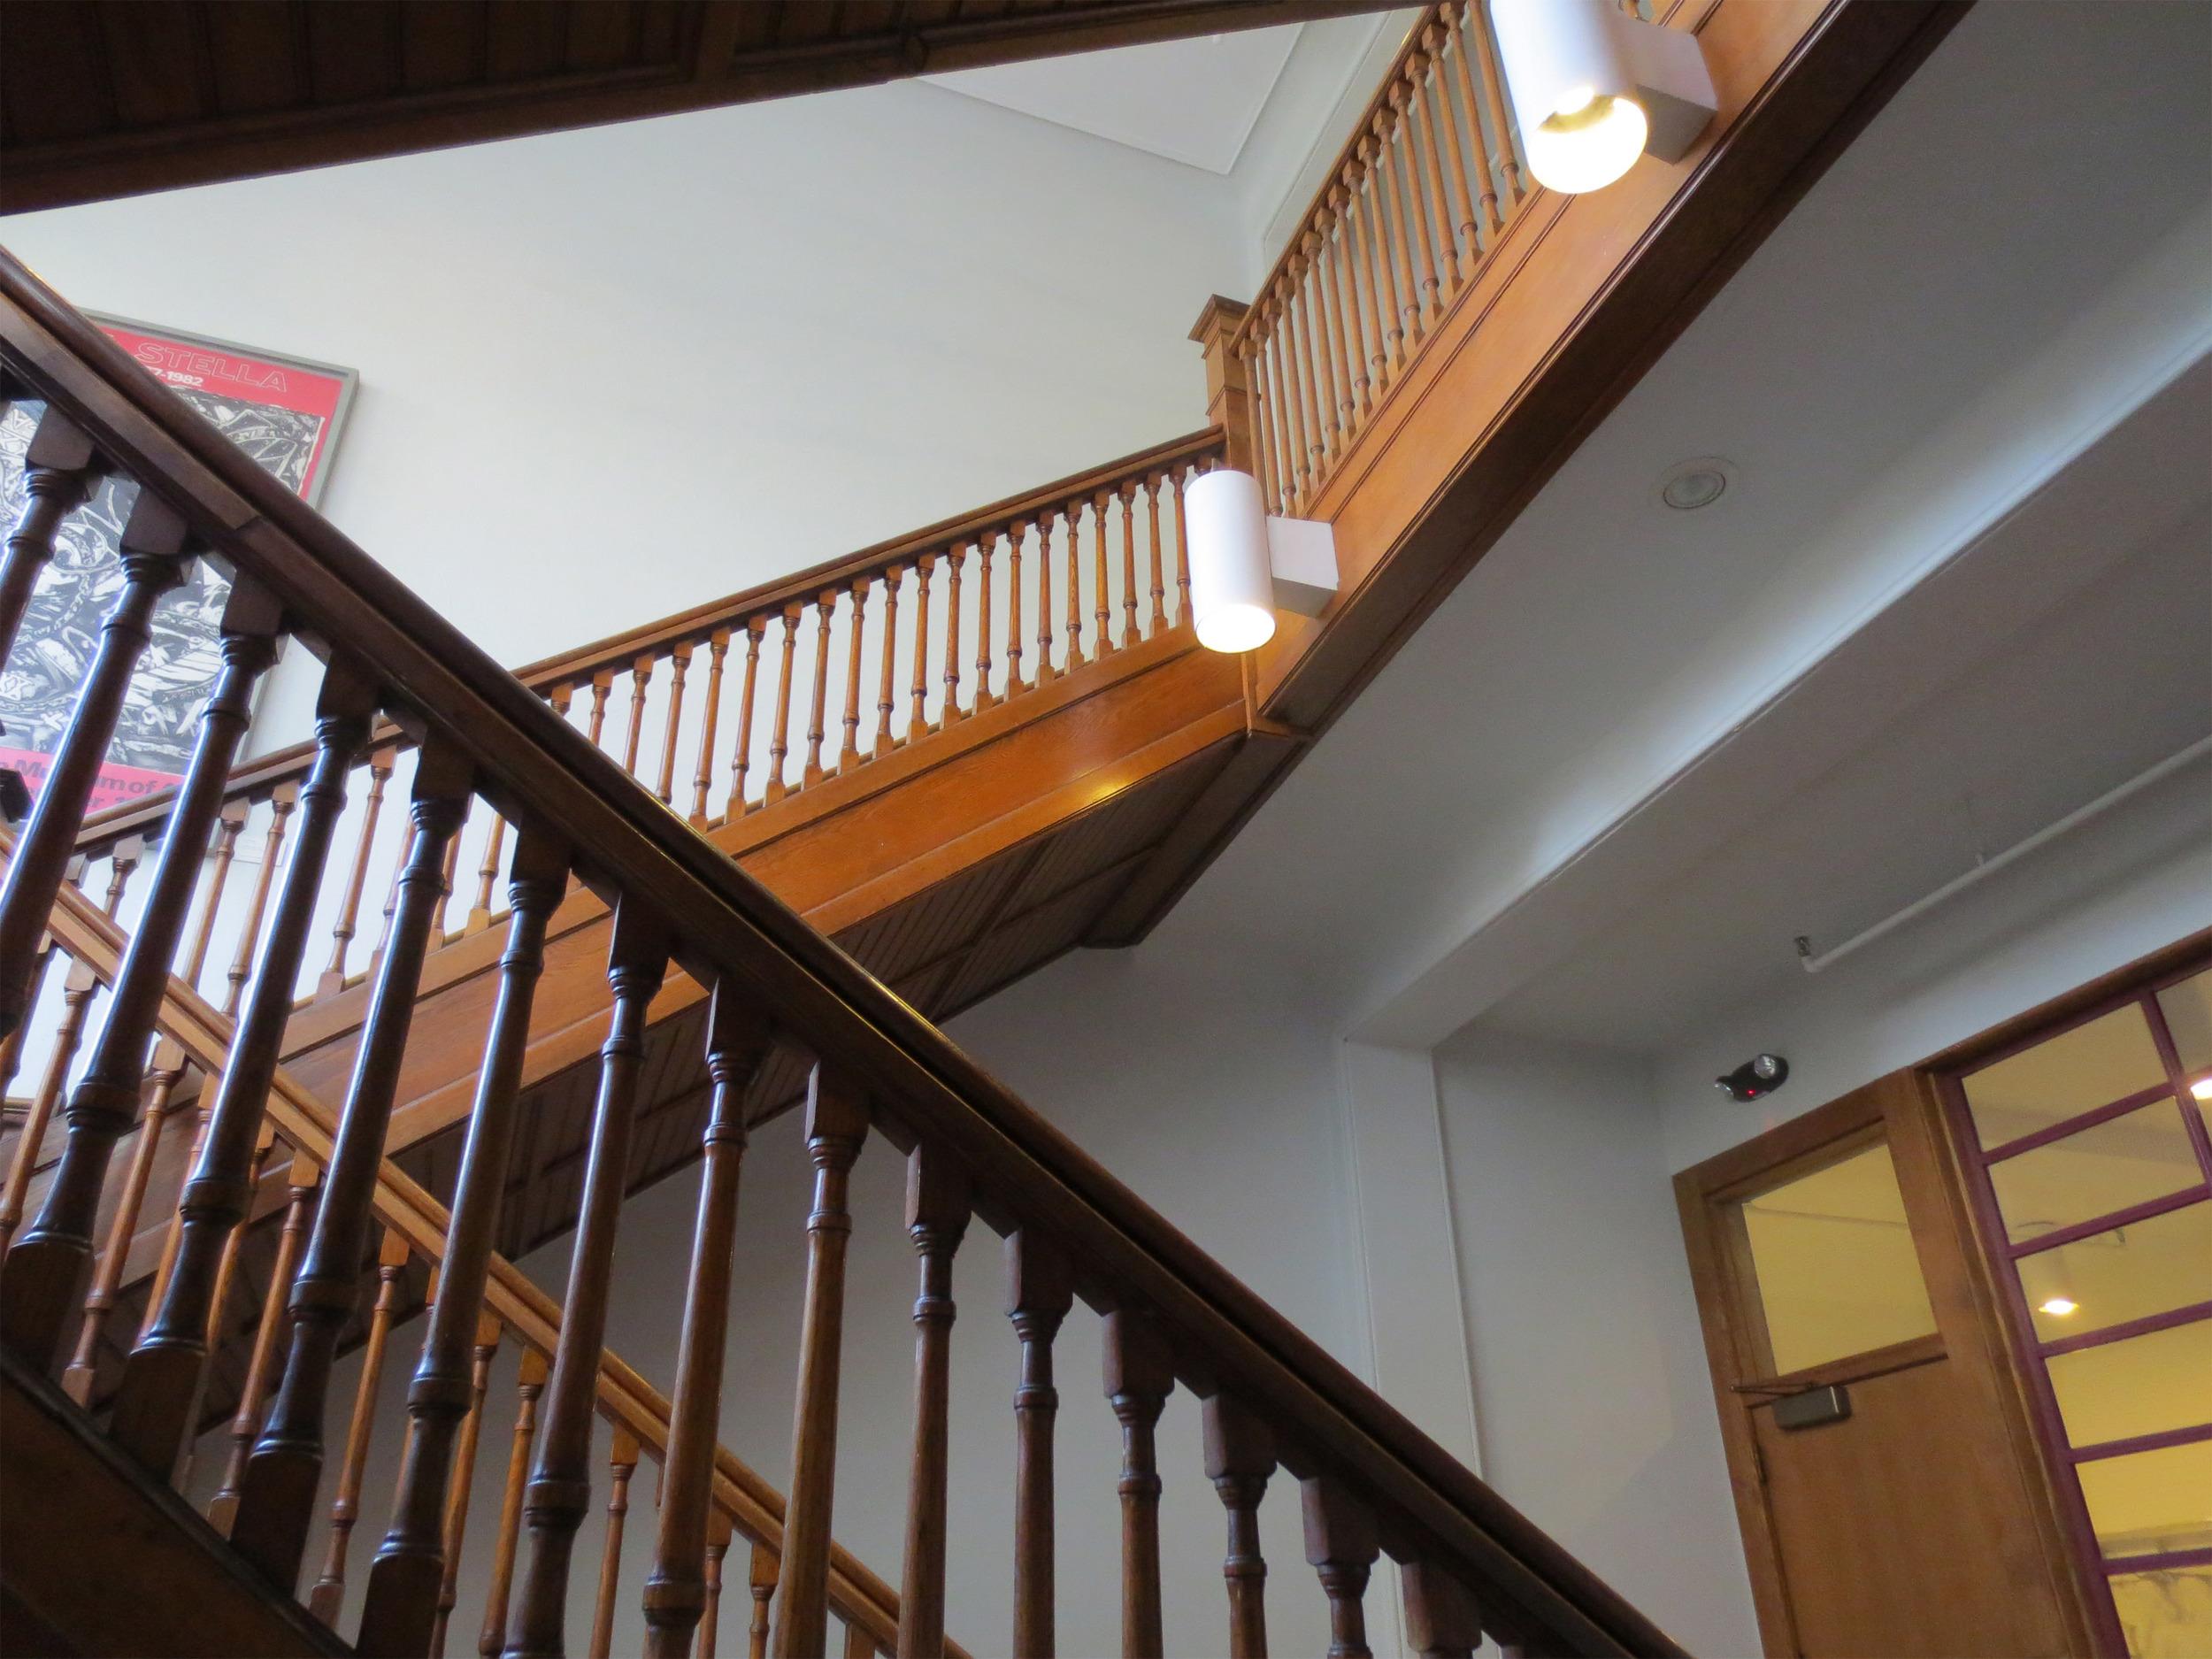 Tappan Hall in Ann Arbor, MI.